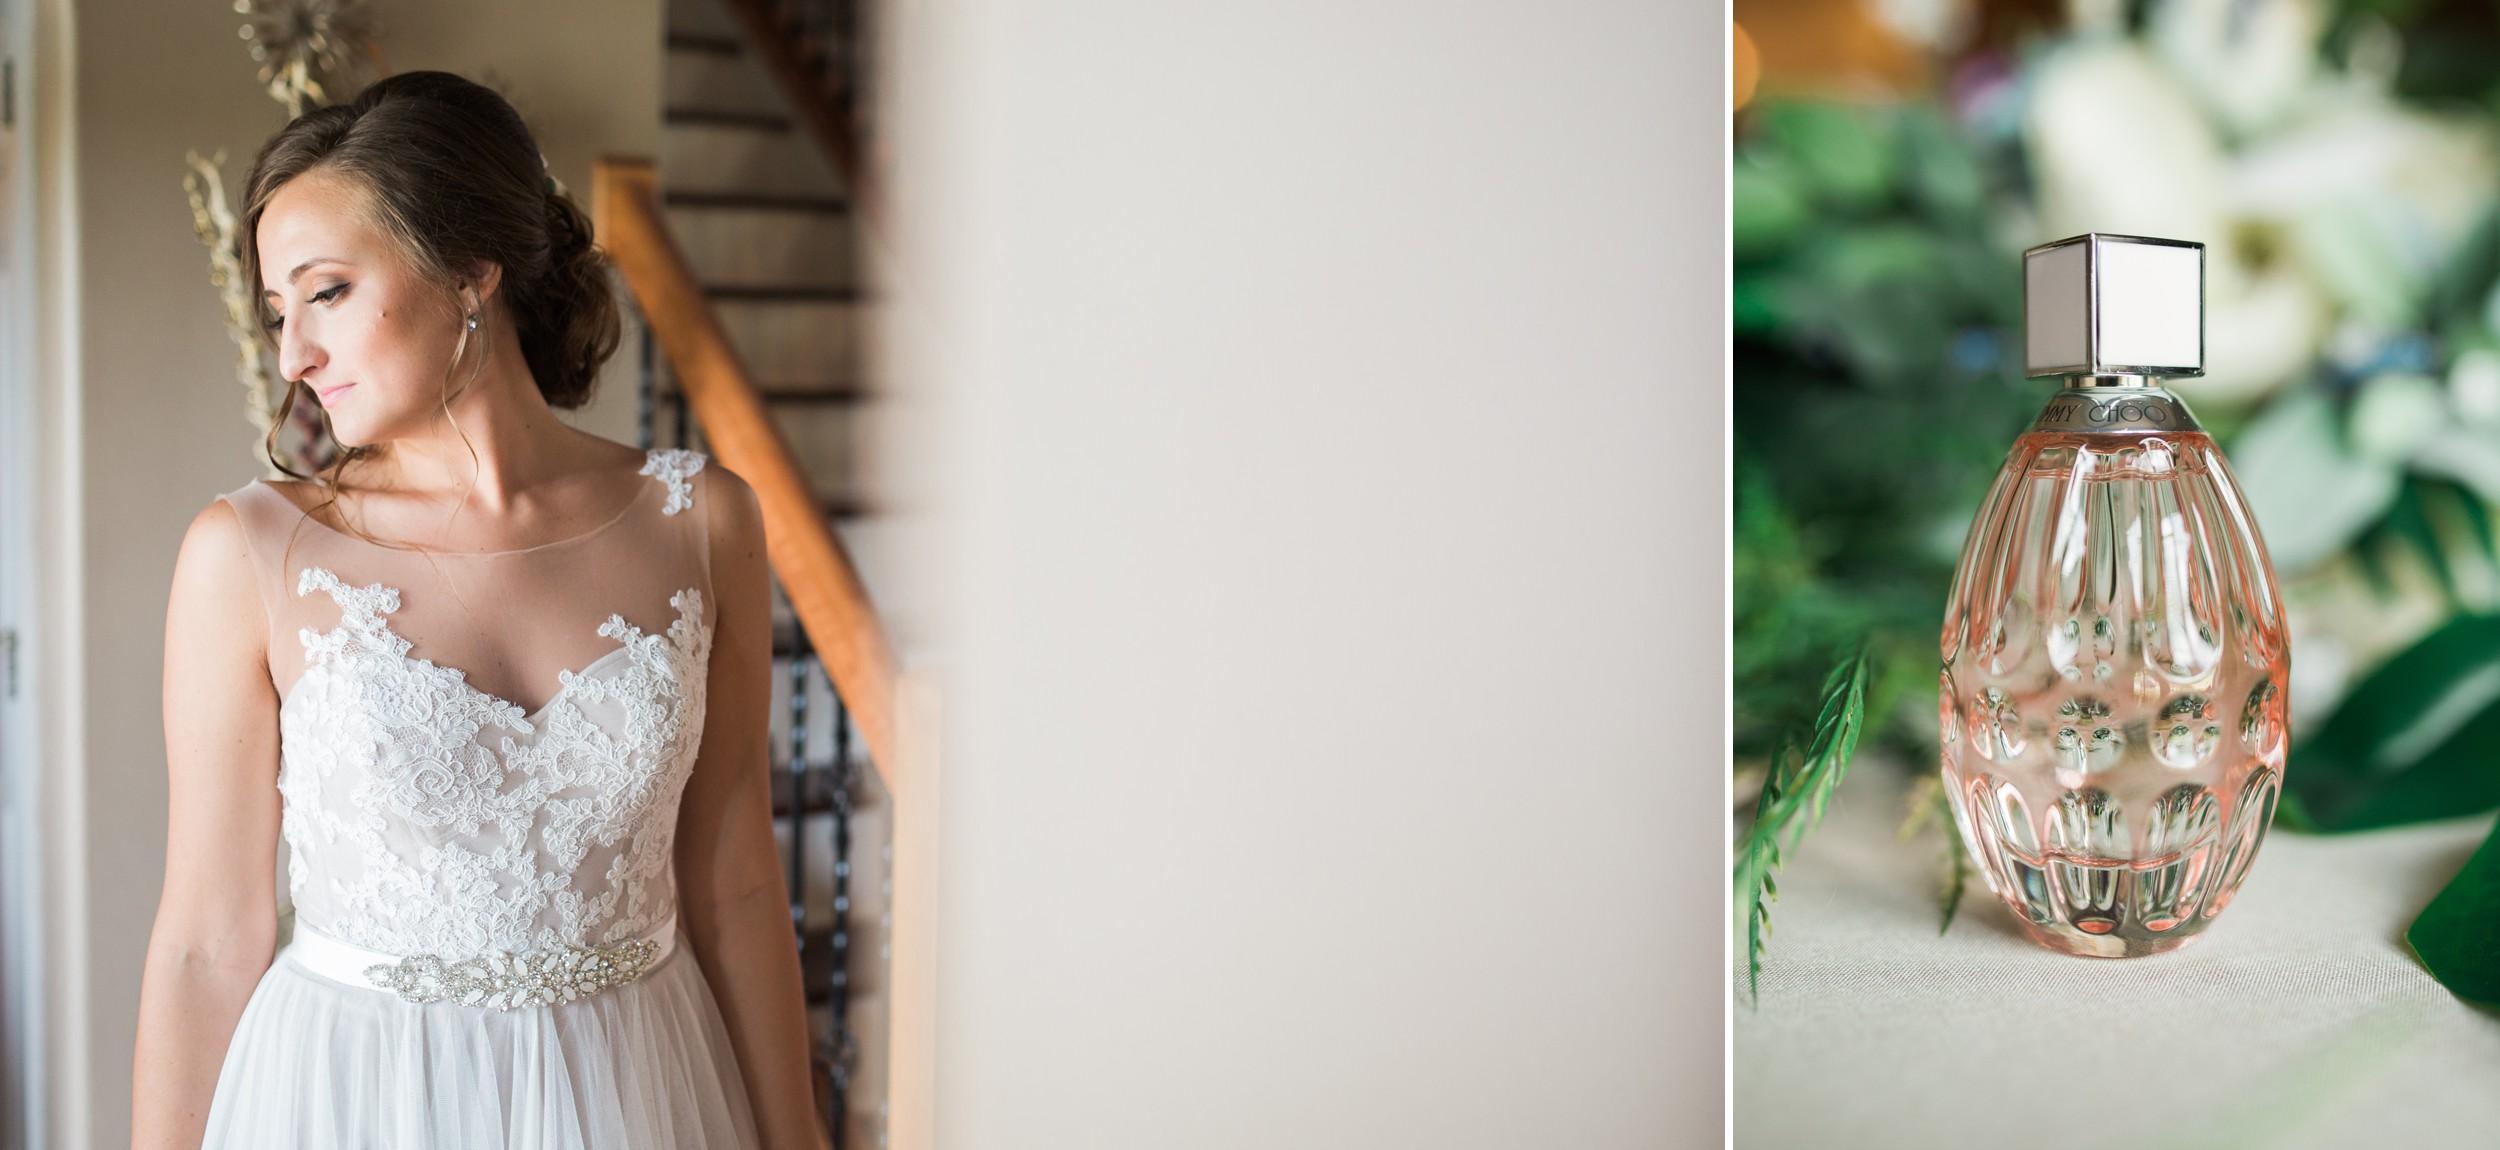 Nick-and-martina-pinelake-vinyards-wedding-columbiana-ohio-tracylynn-photography 3.jpg